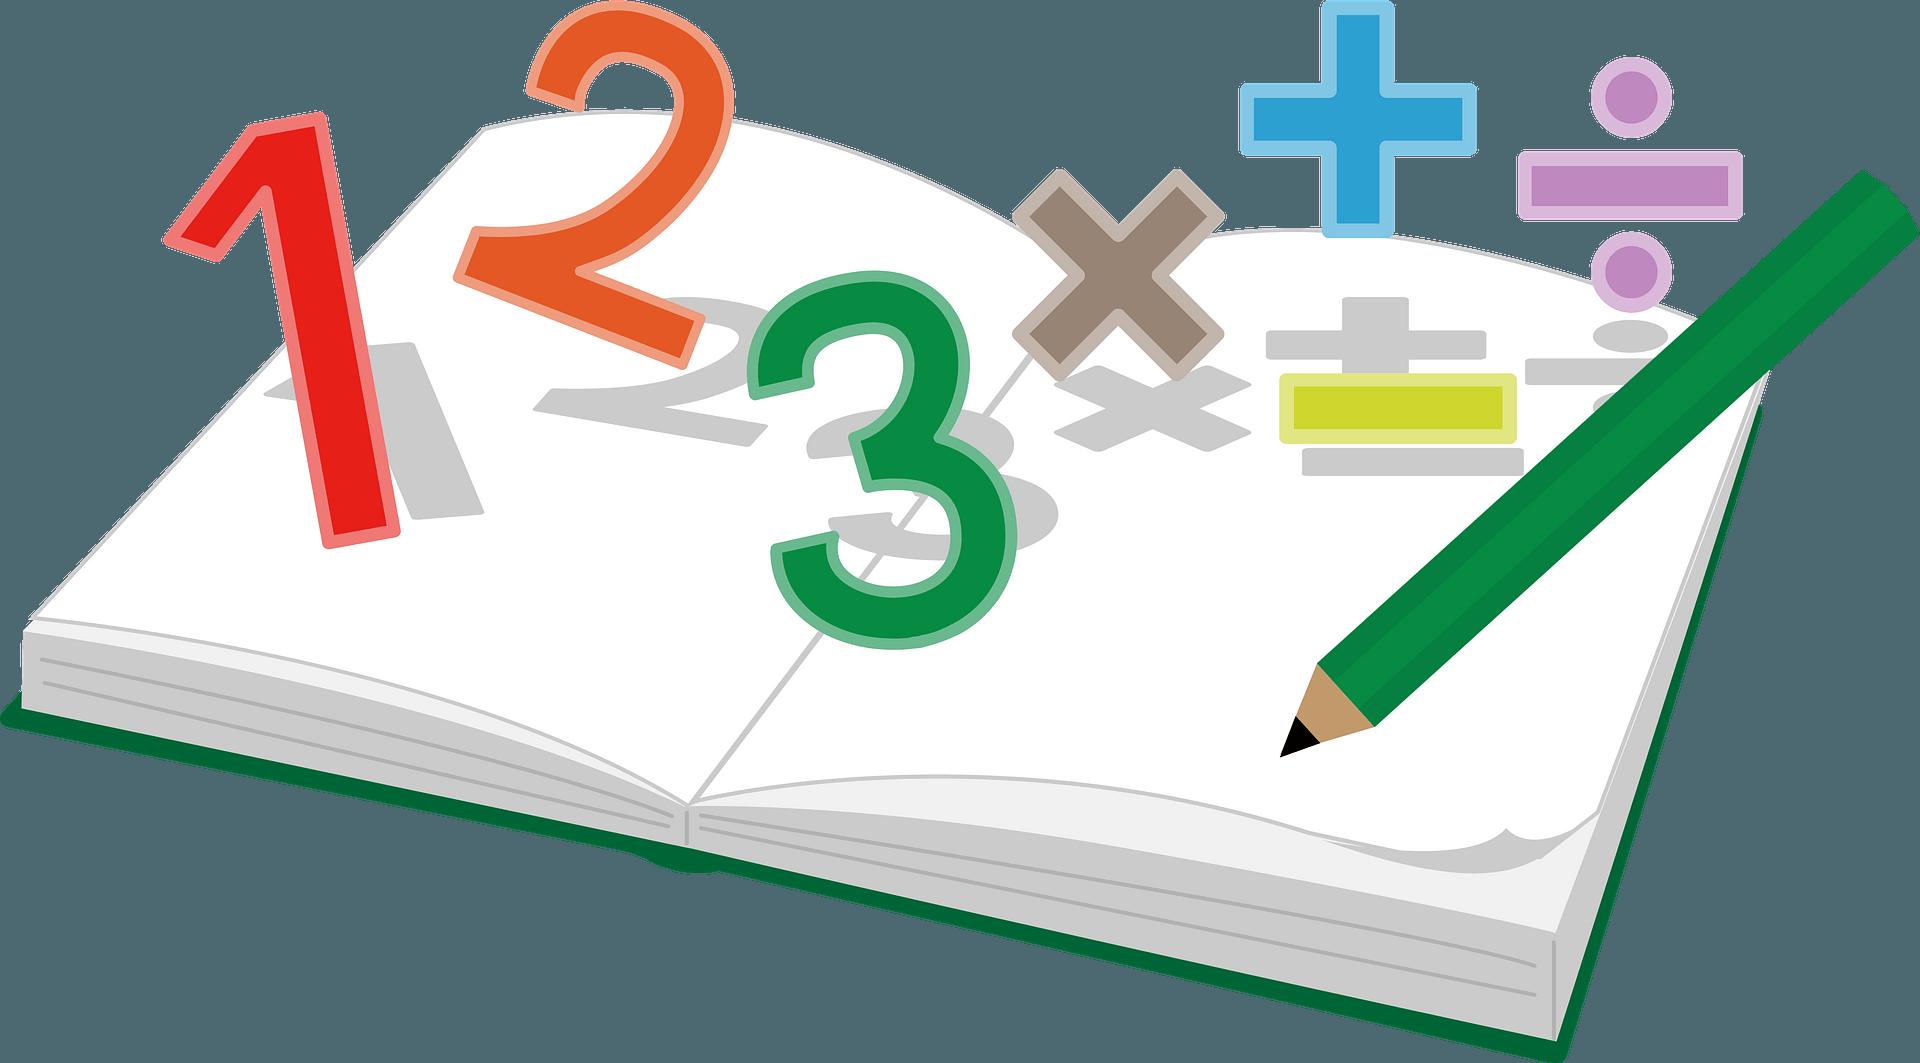 Elementary Mathematics Clipart Free Download Transparent Png Creazilla